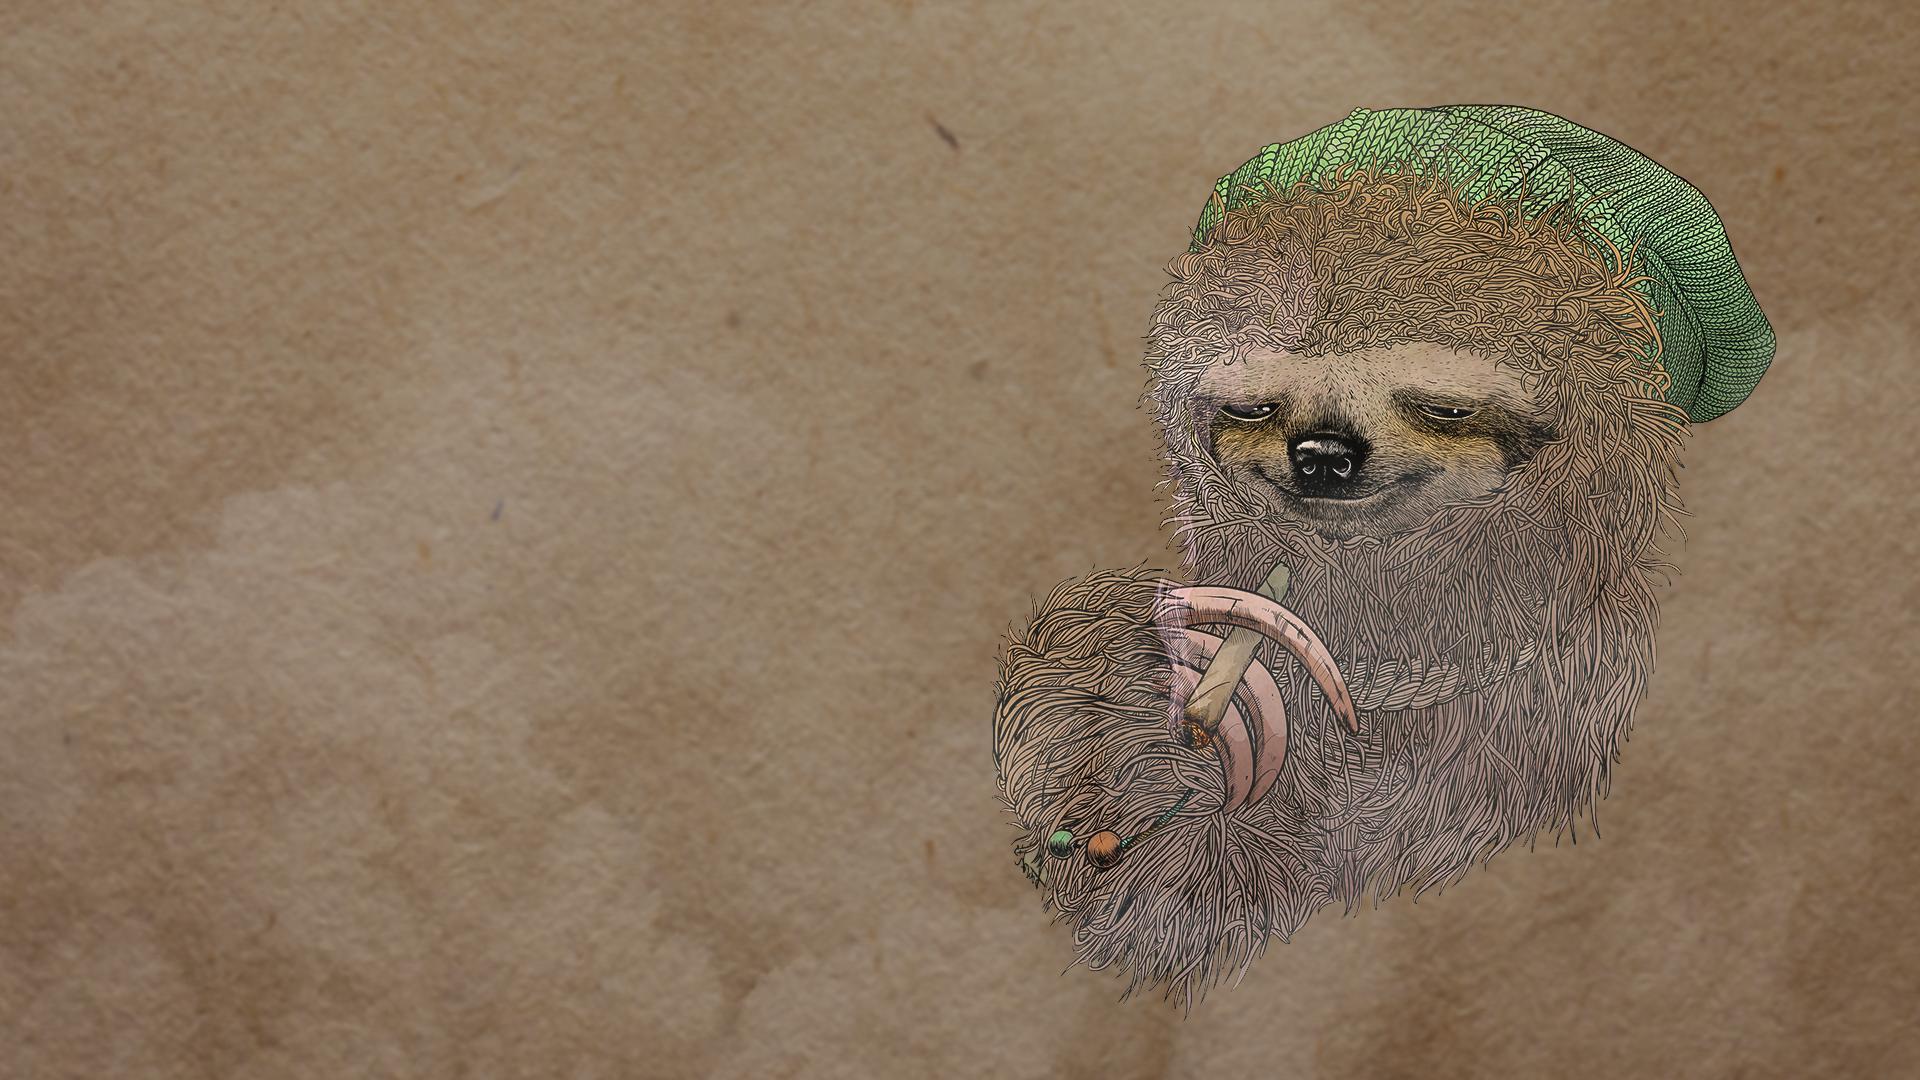 Stoner Iphone Wallpaper Download Sloth Hd Backgrounds Free Pixelstalk Net